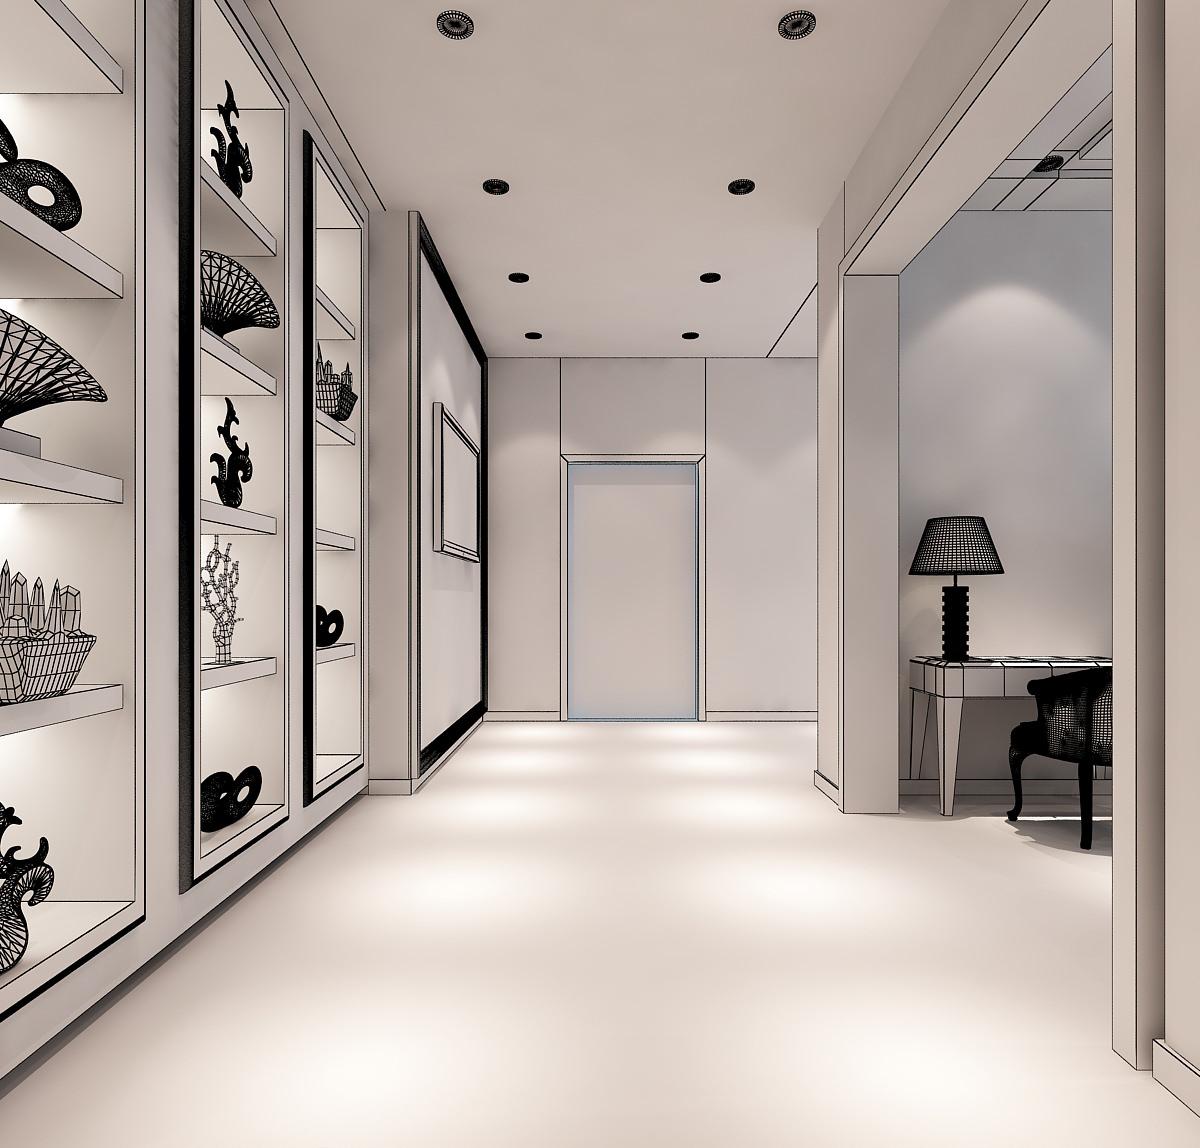 Showroom Interior Designshowroom Interior Design: 3D Models Clothing Showroom Interior 3D Model MAX